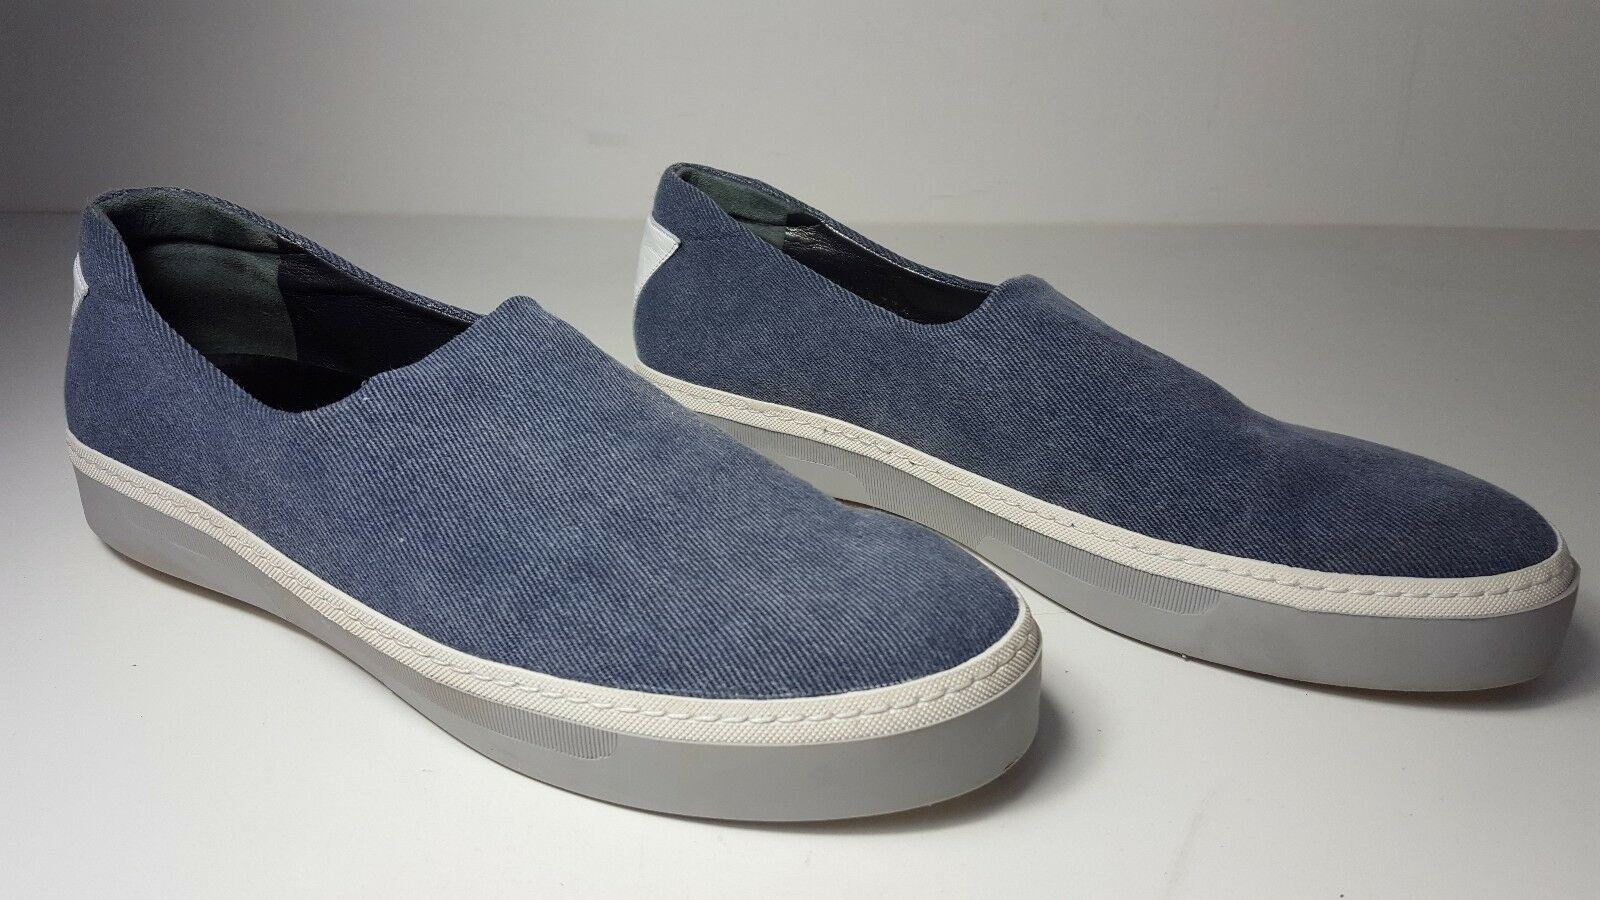 Stuart Weitzman Flair Azul Jeans Zapatos Tenis Tenis Tenis Slip Ons Stretch d76c6f